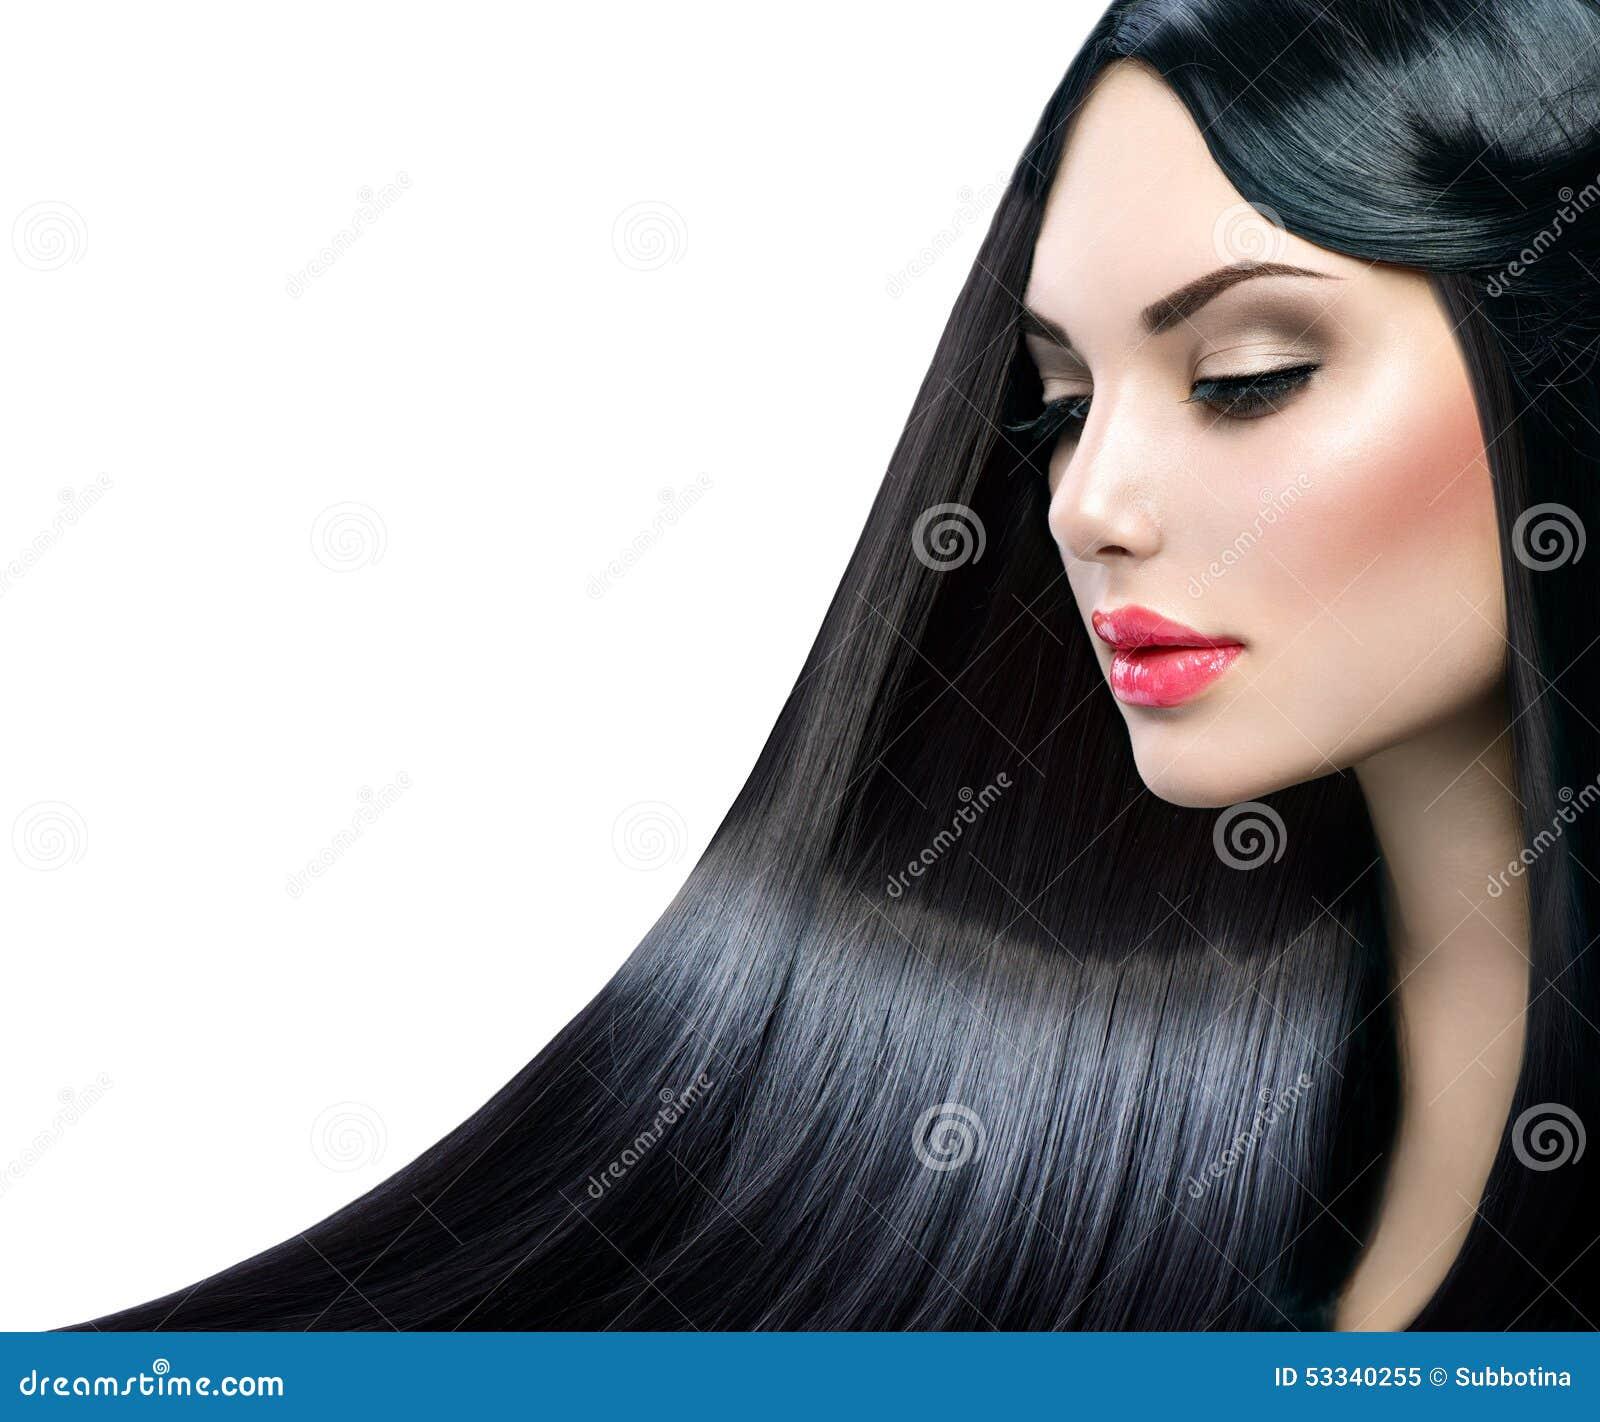 hair stock photos - photo #42